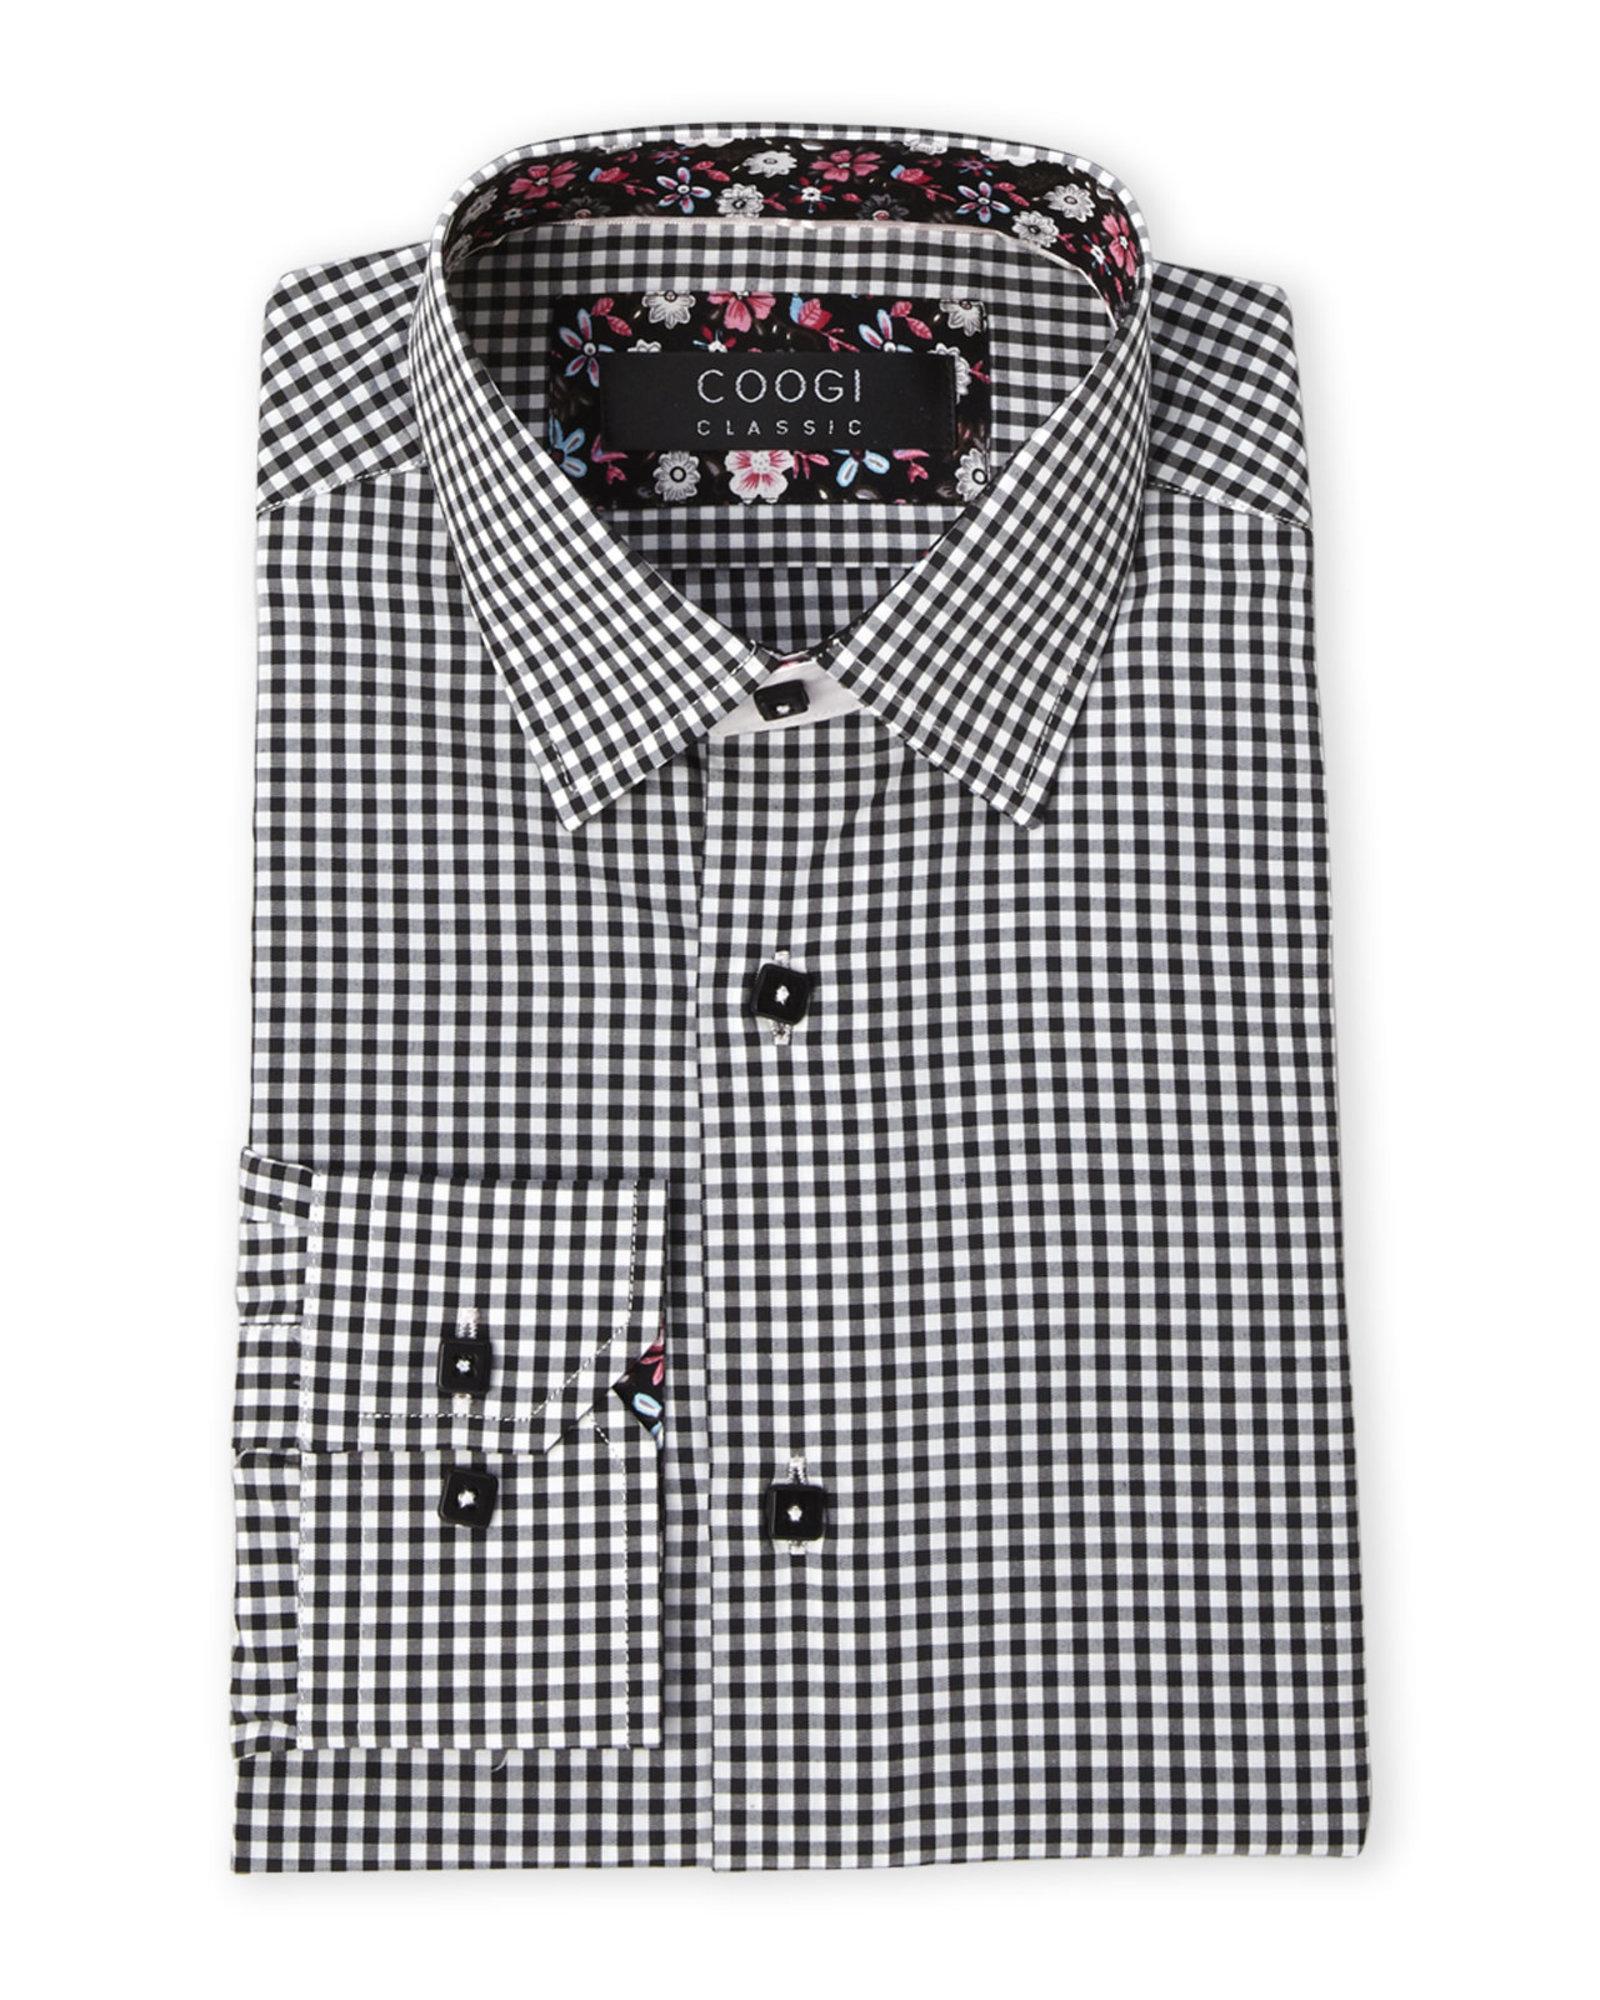 Coogi Black Check Dress Shirt In Black For Men Lyst